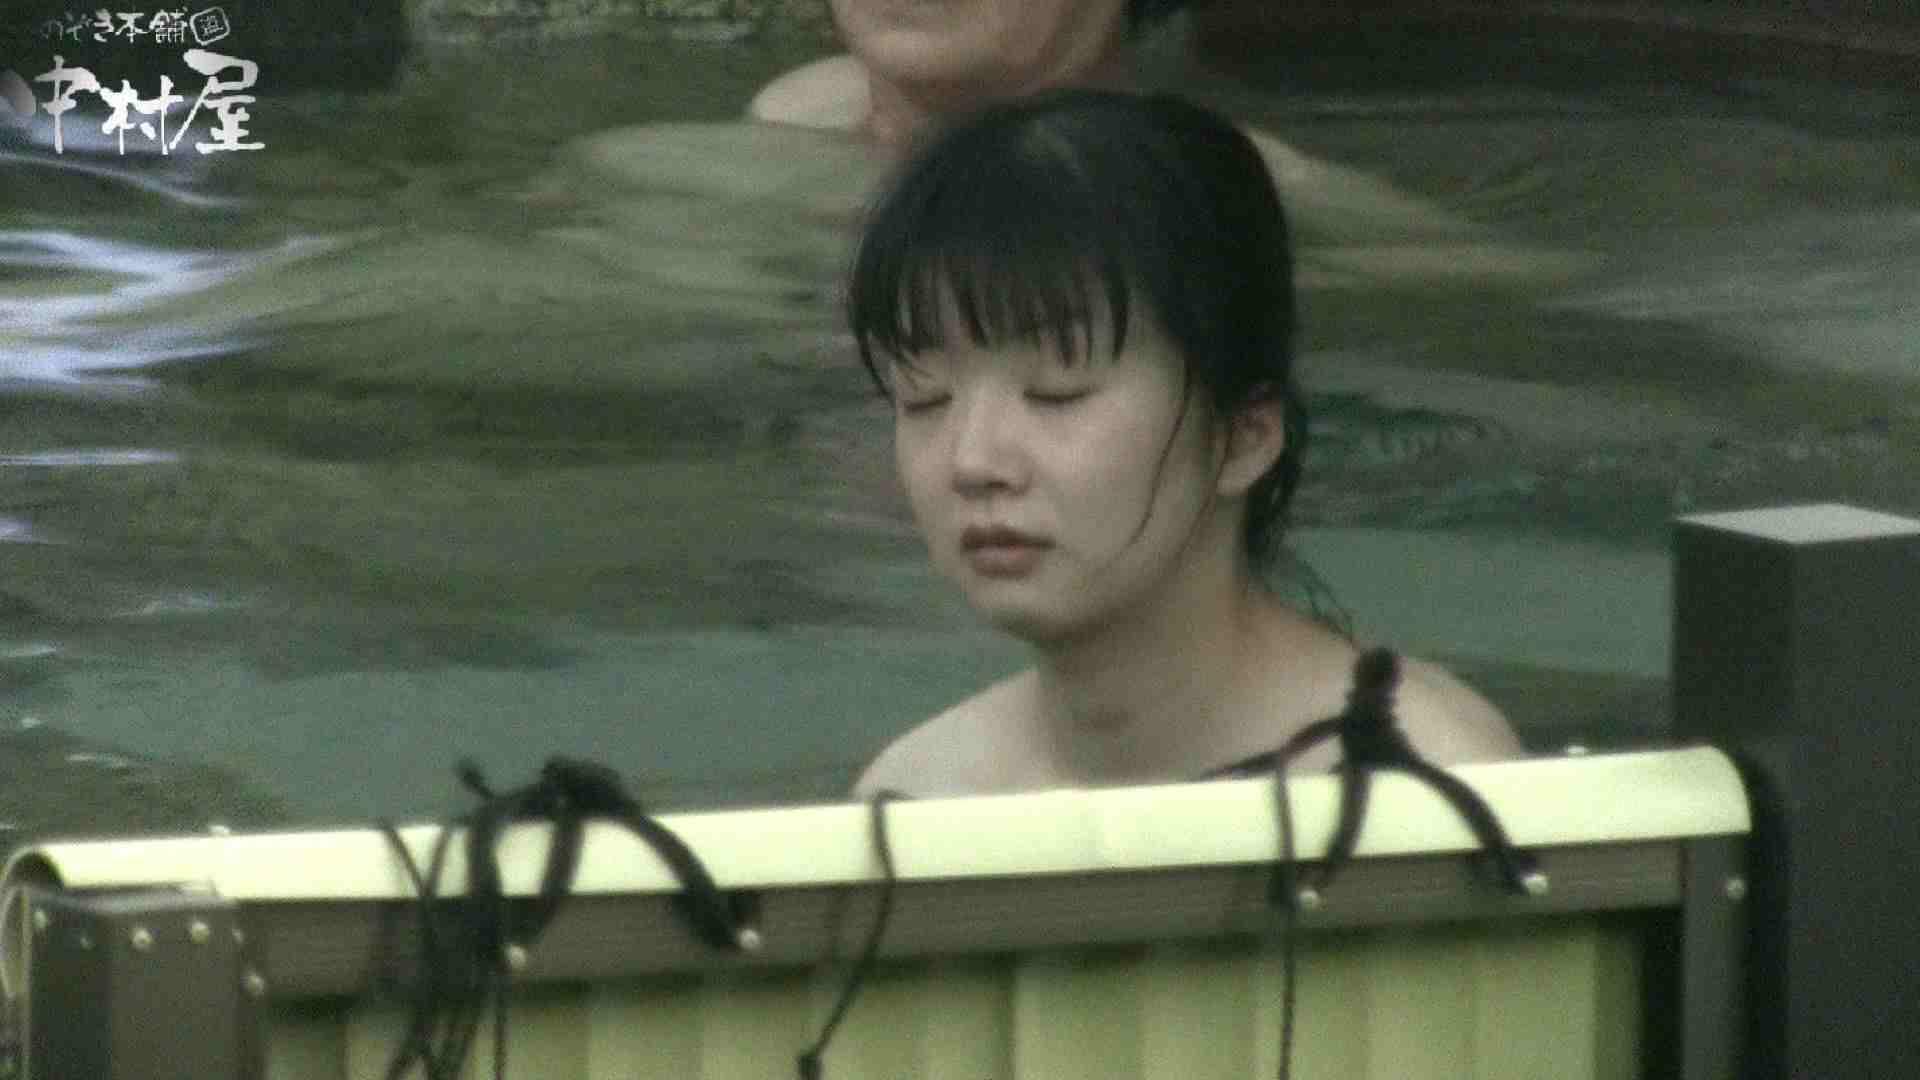 Aquaな露天風呂Vol.904 盗撮師作品  103pic 15